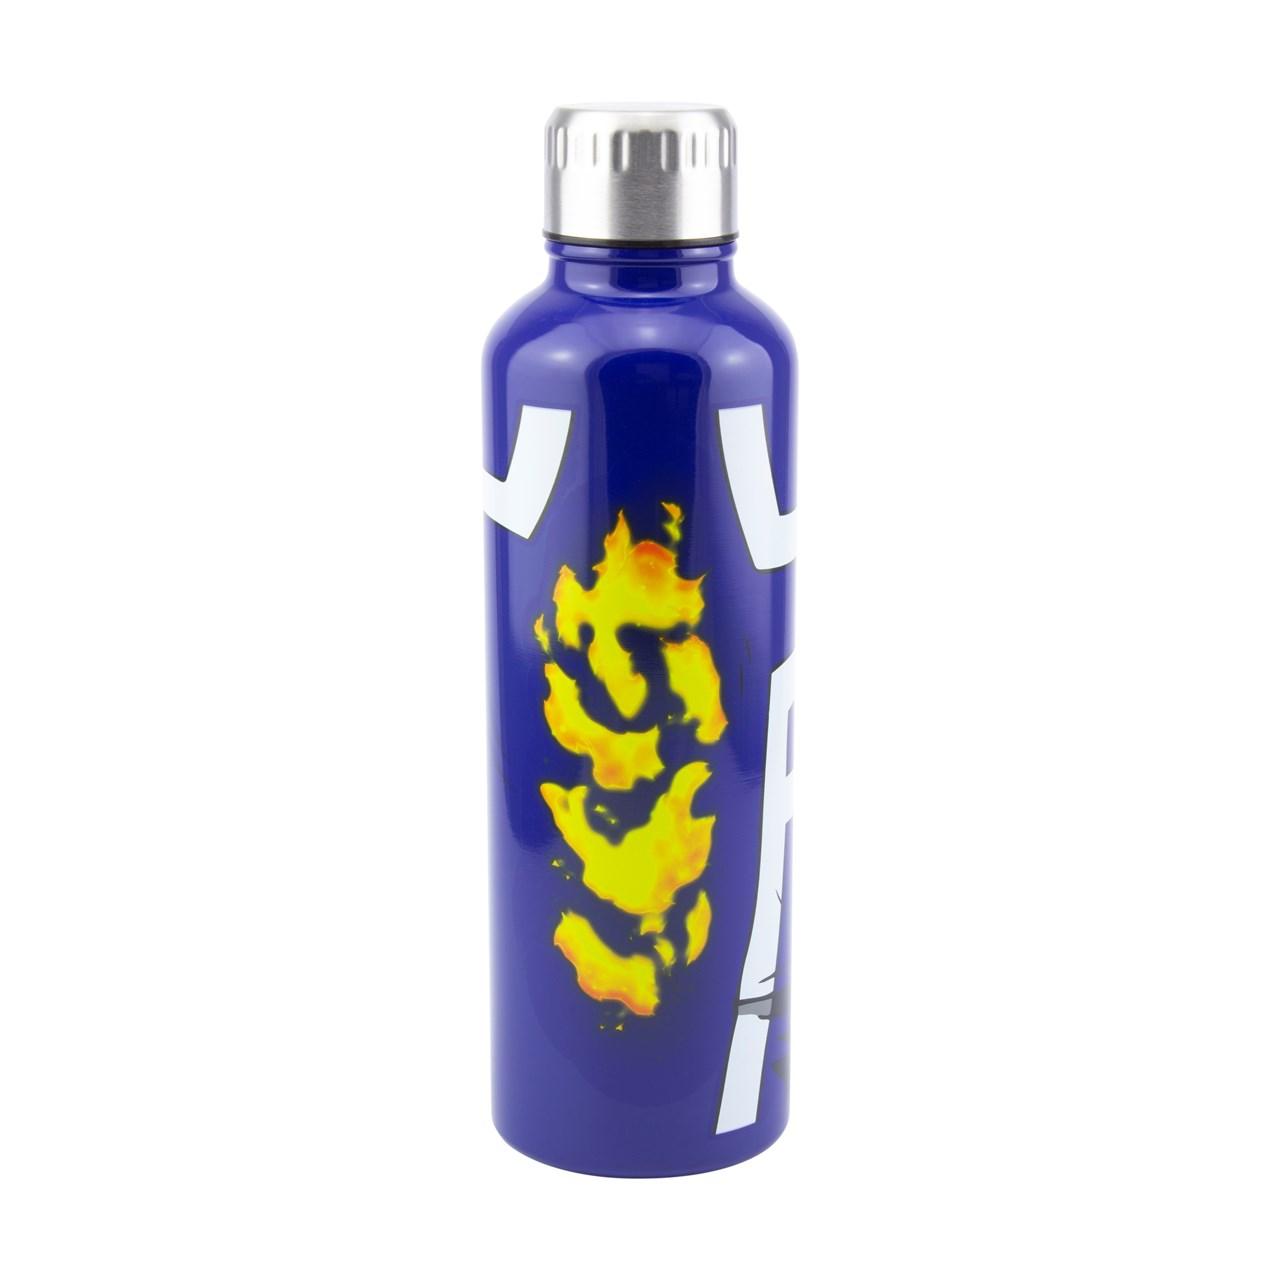 My Hero Academia Metal Water Bottle - 4